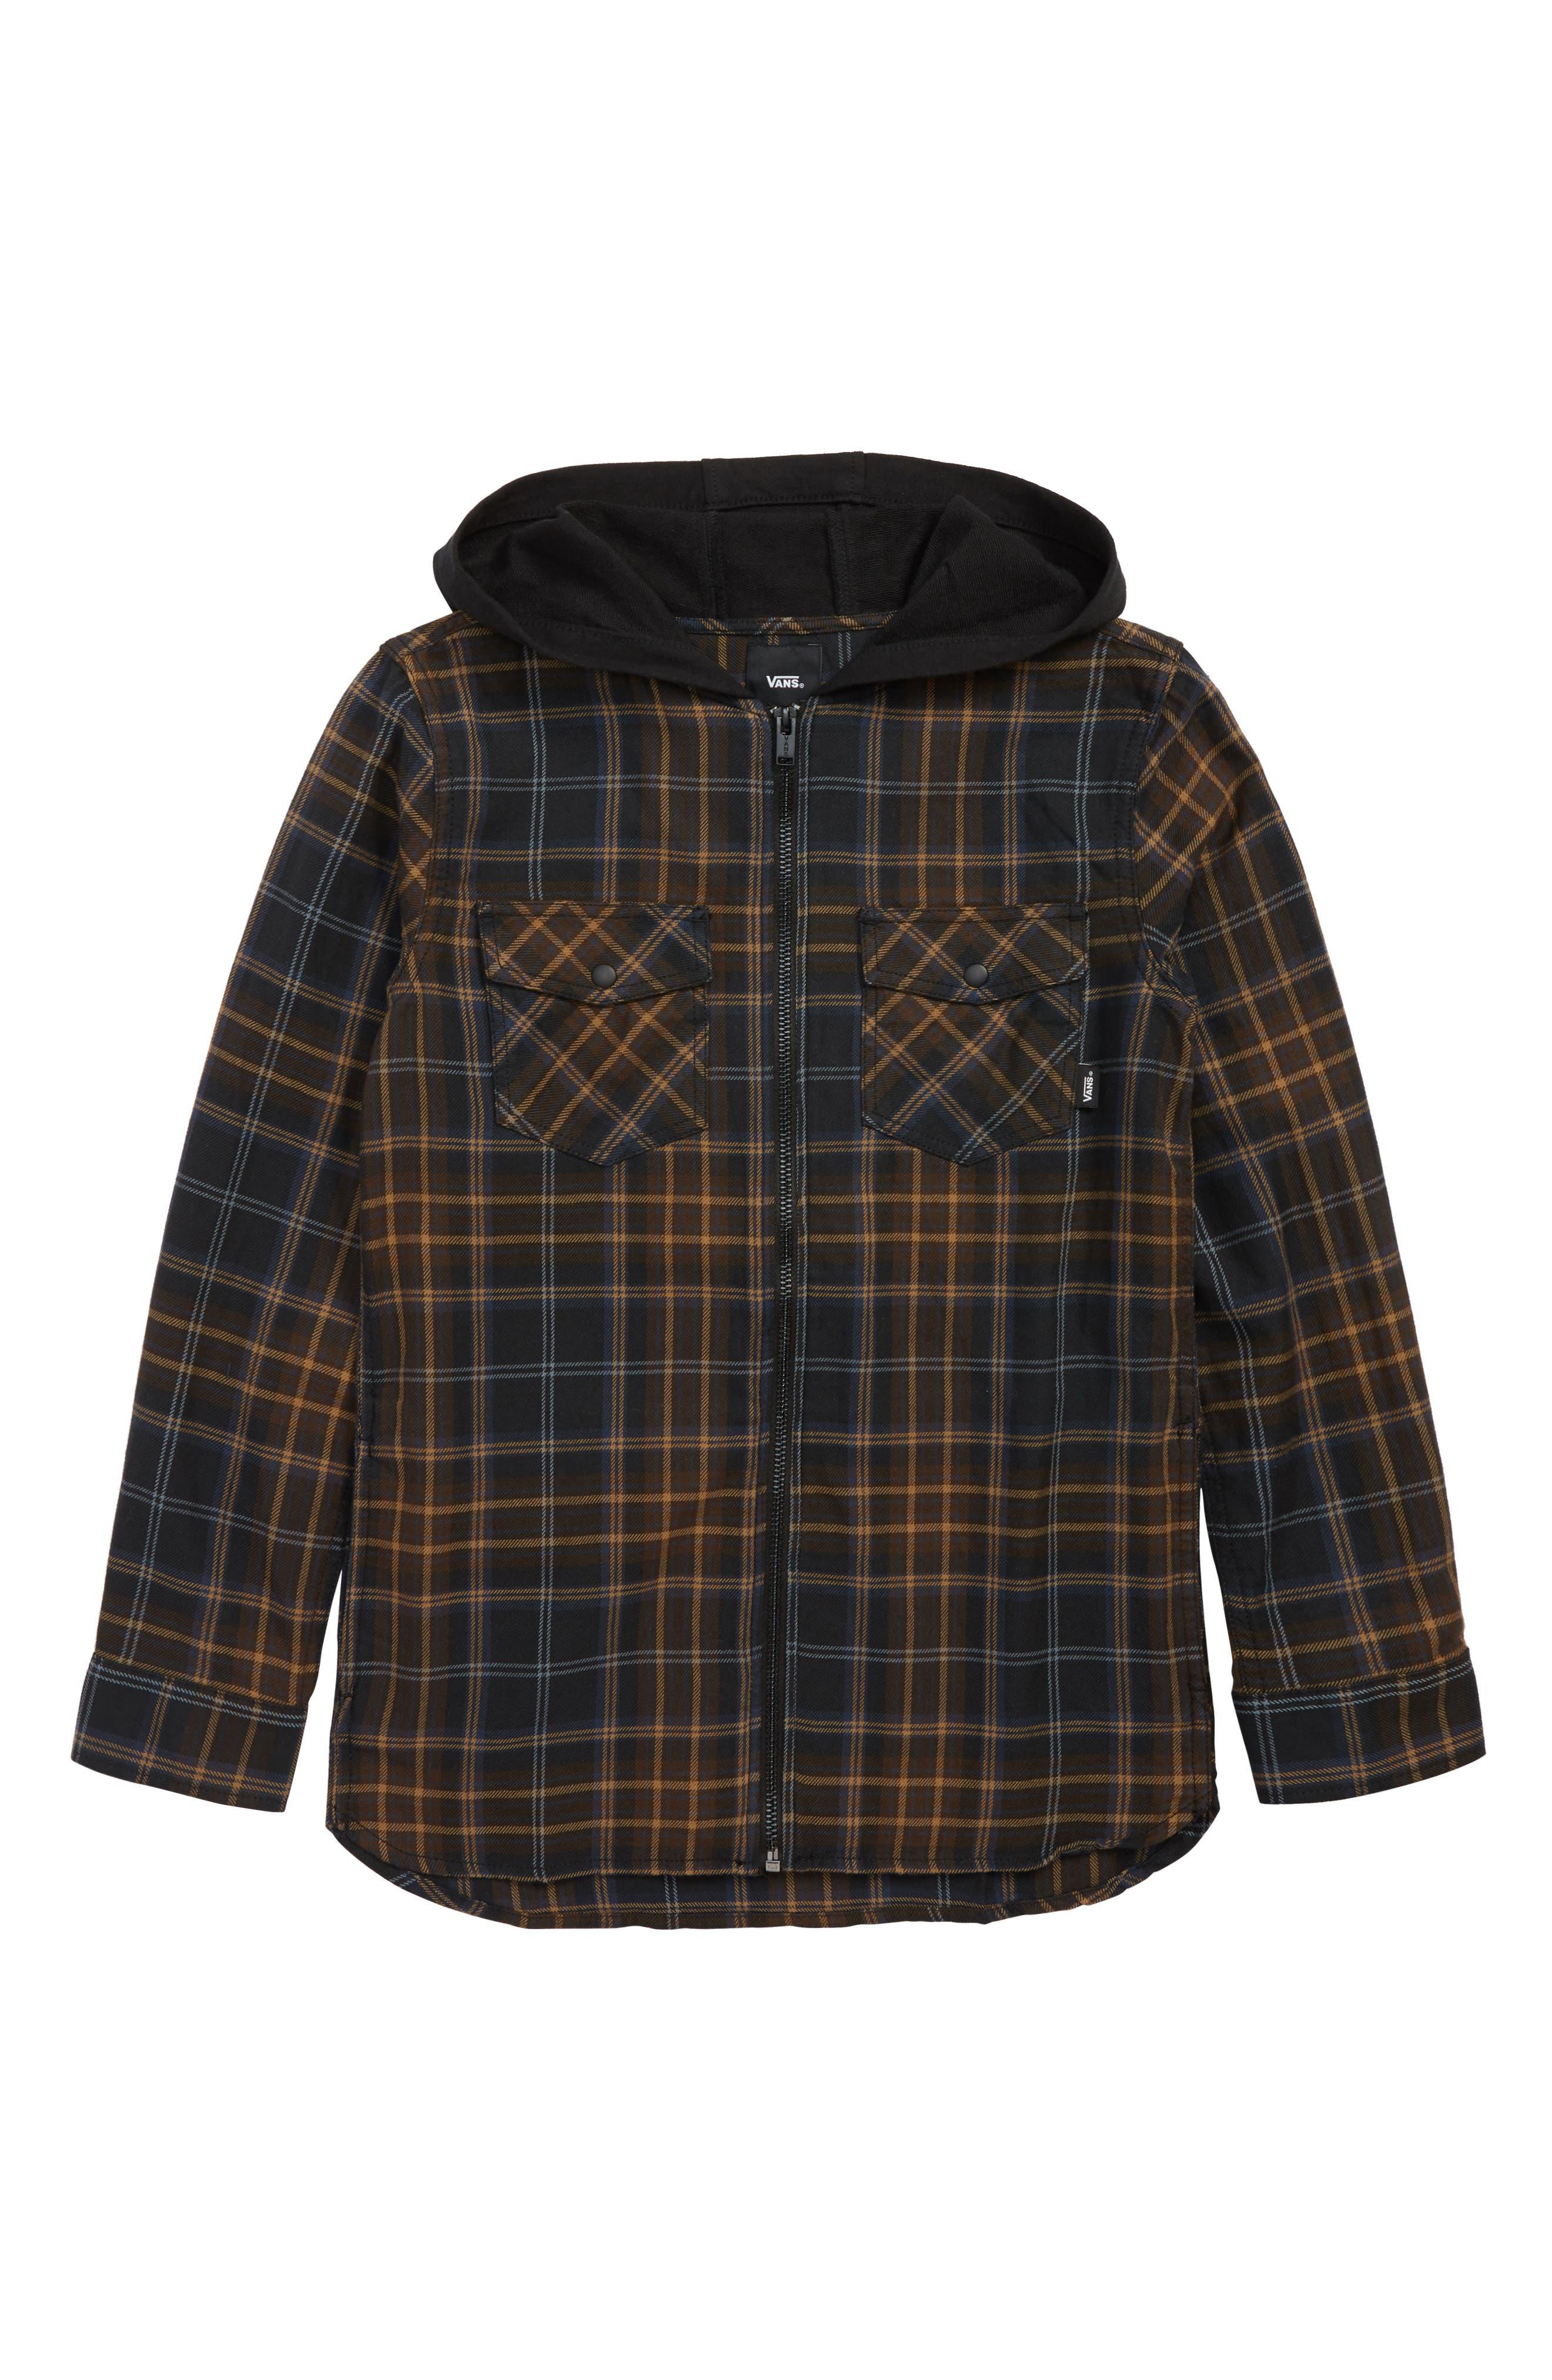 Higgins Zip Flannel Shirt,                             Main thumbnail 1, color,                             001